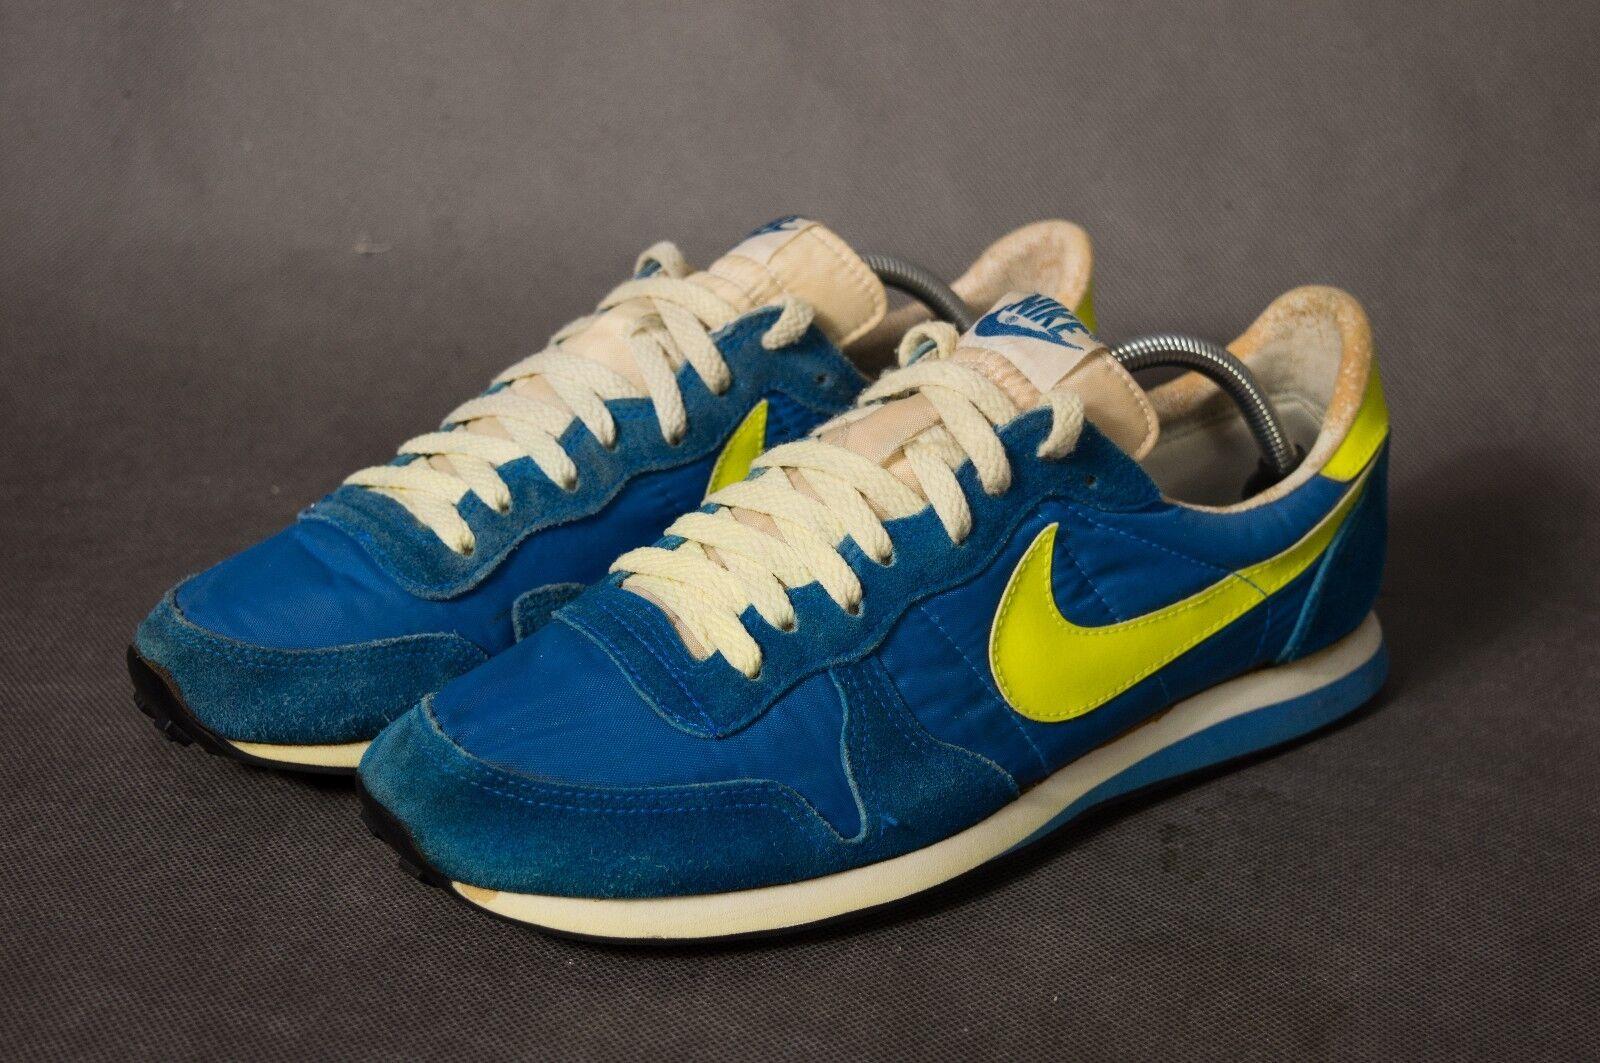 Men`s Vintage 1982 Nike Running Shoes Sz 11 1/2 Suede Nylon Blue / Yellow Korea